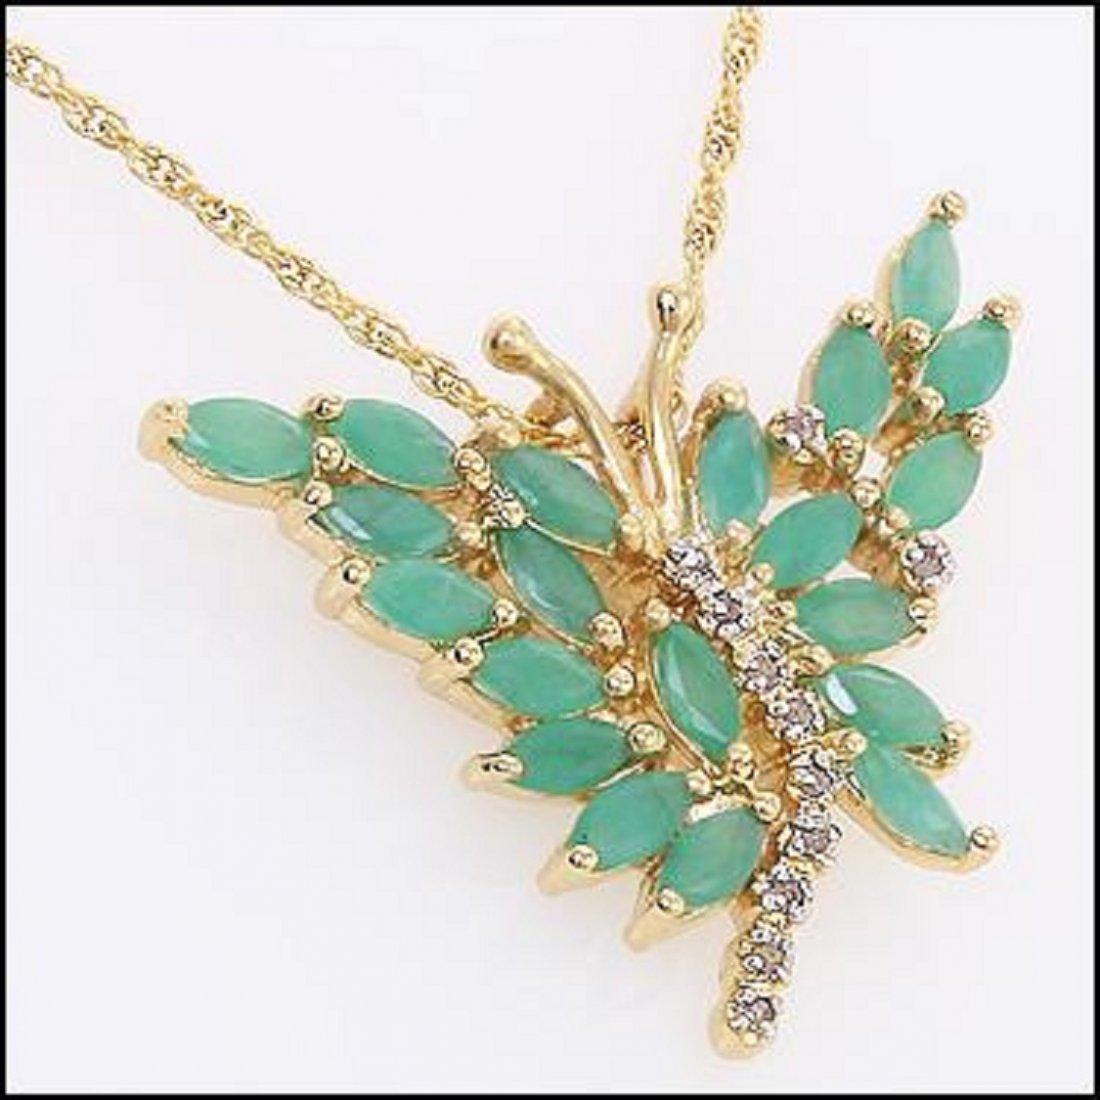 3.89 CT Emerald & Diamond 18K Designer Necklace $1180